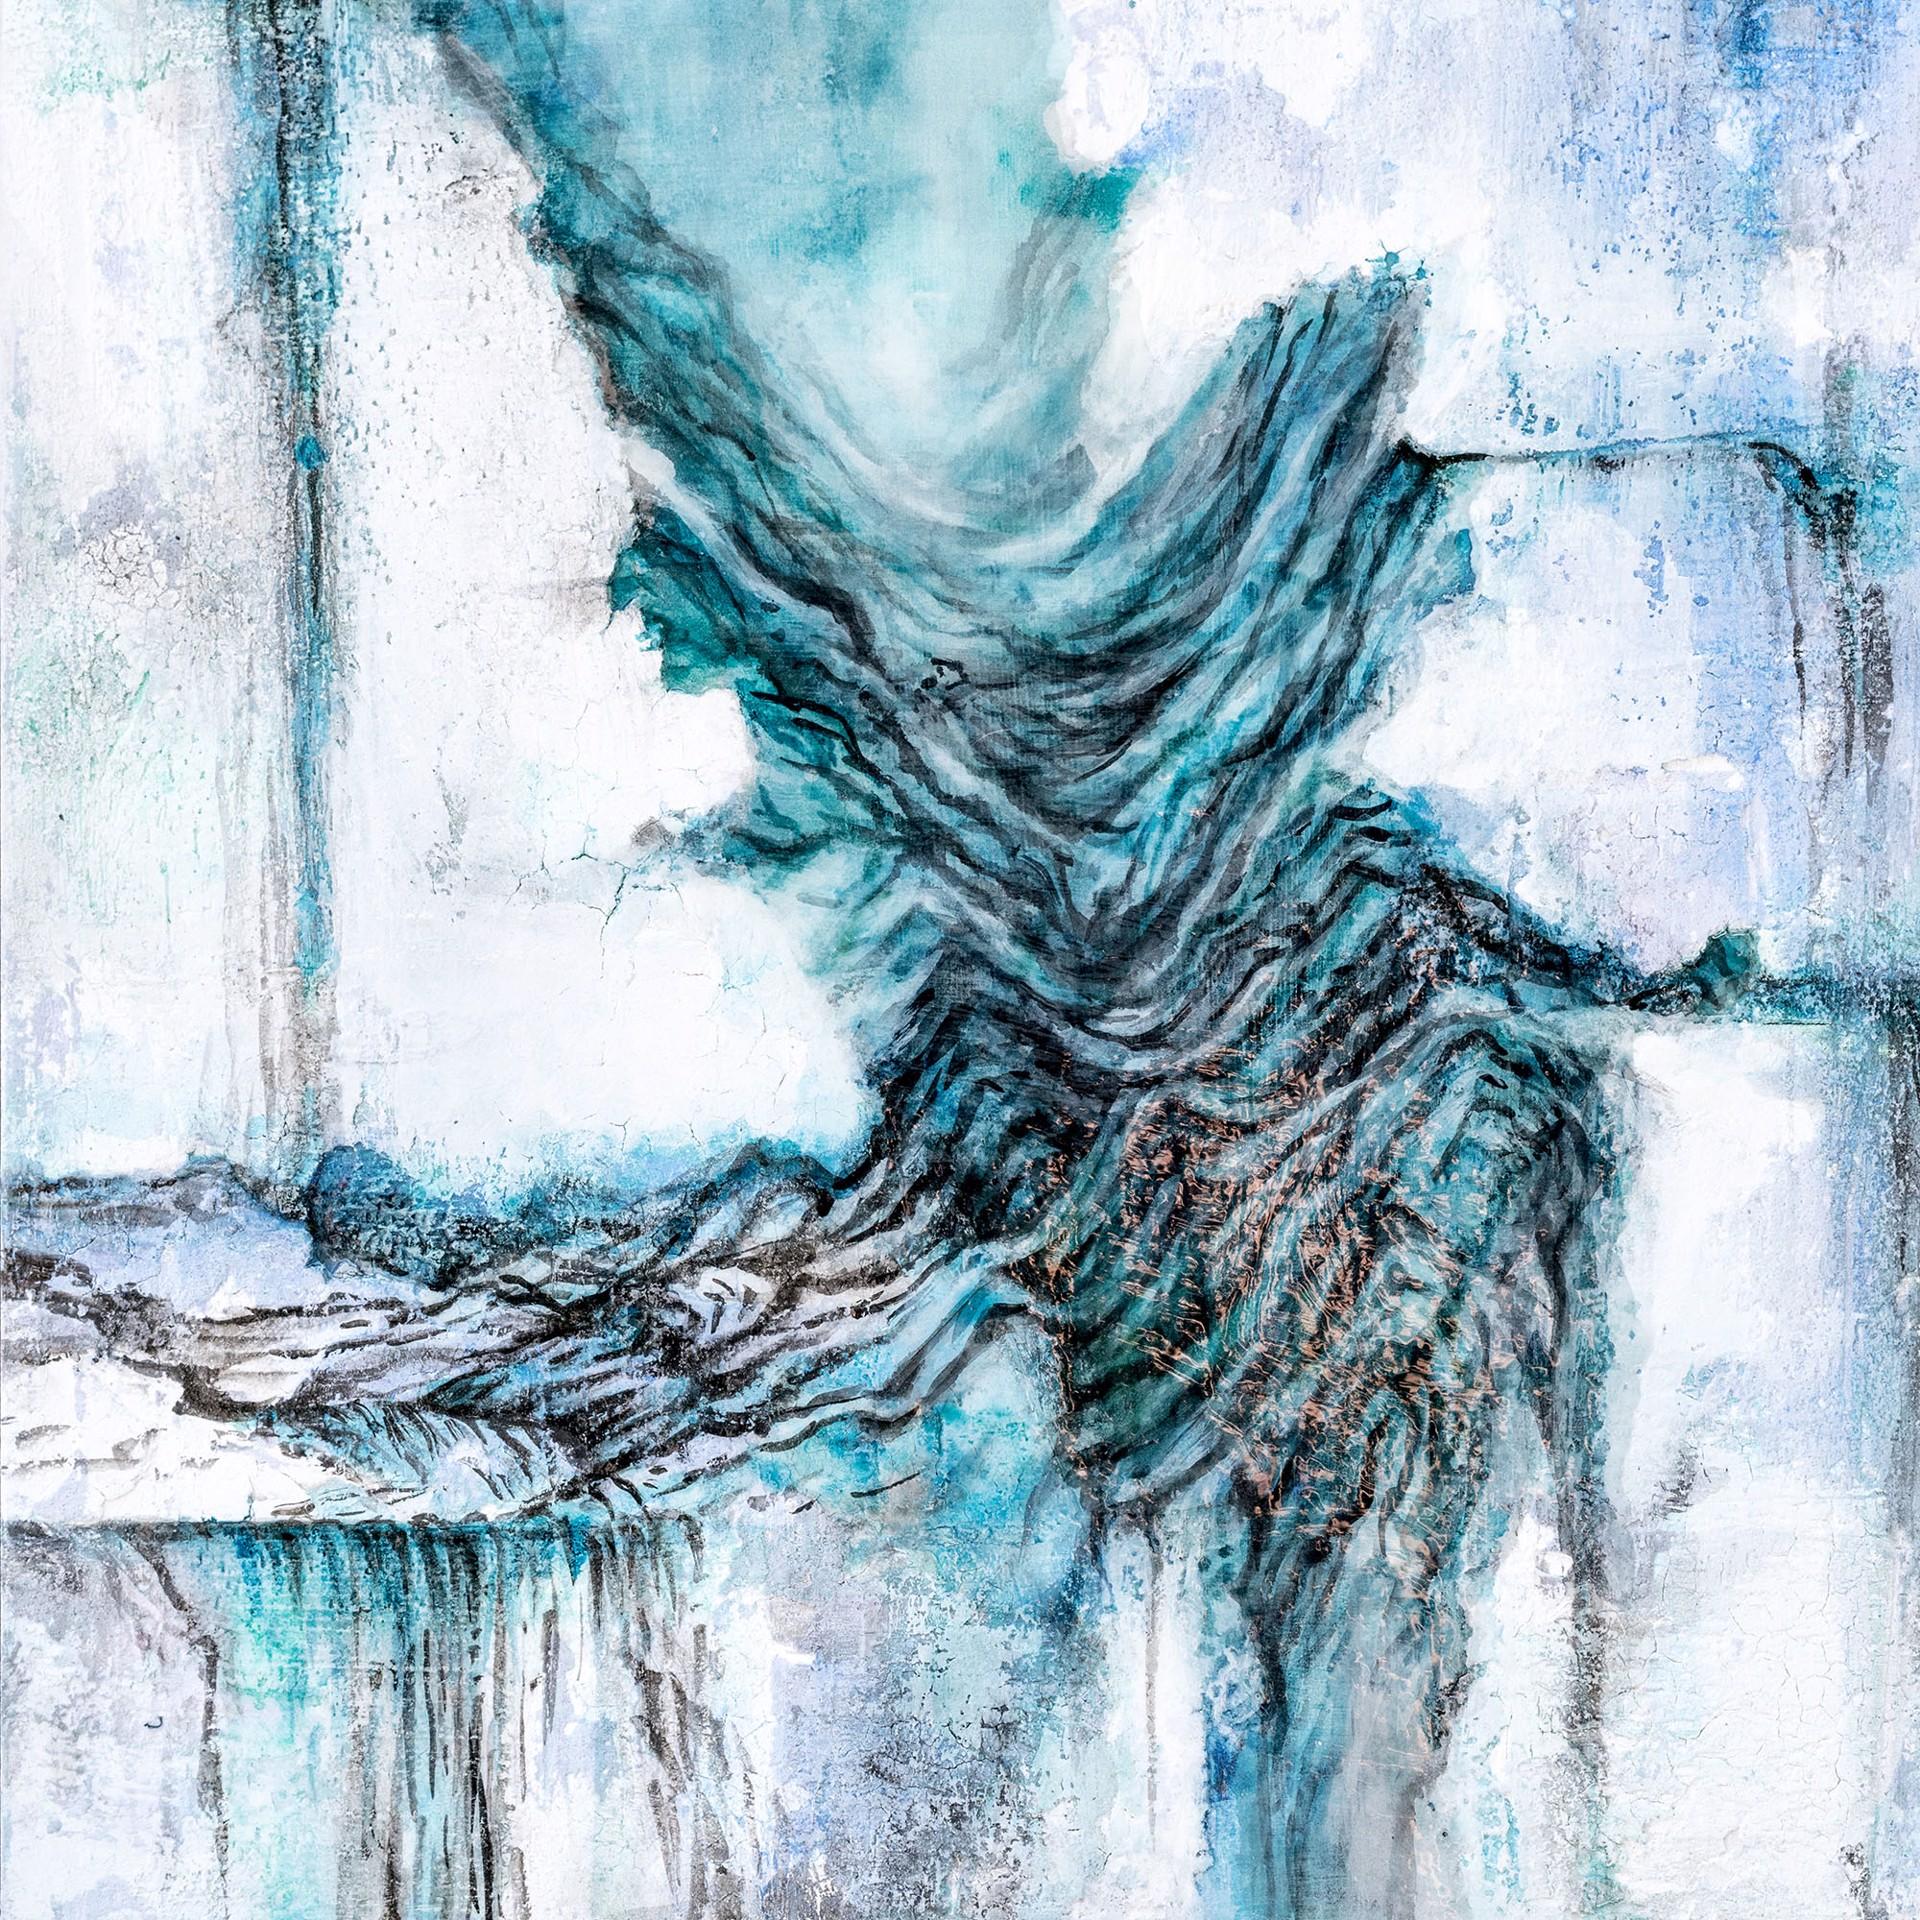 Ebb & Flow by Cindy Shih